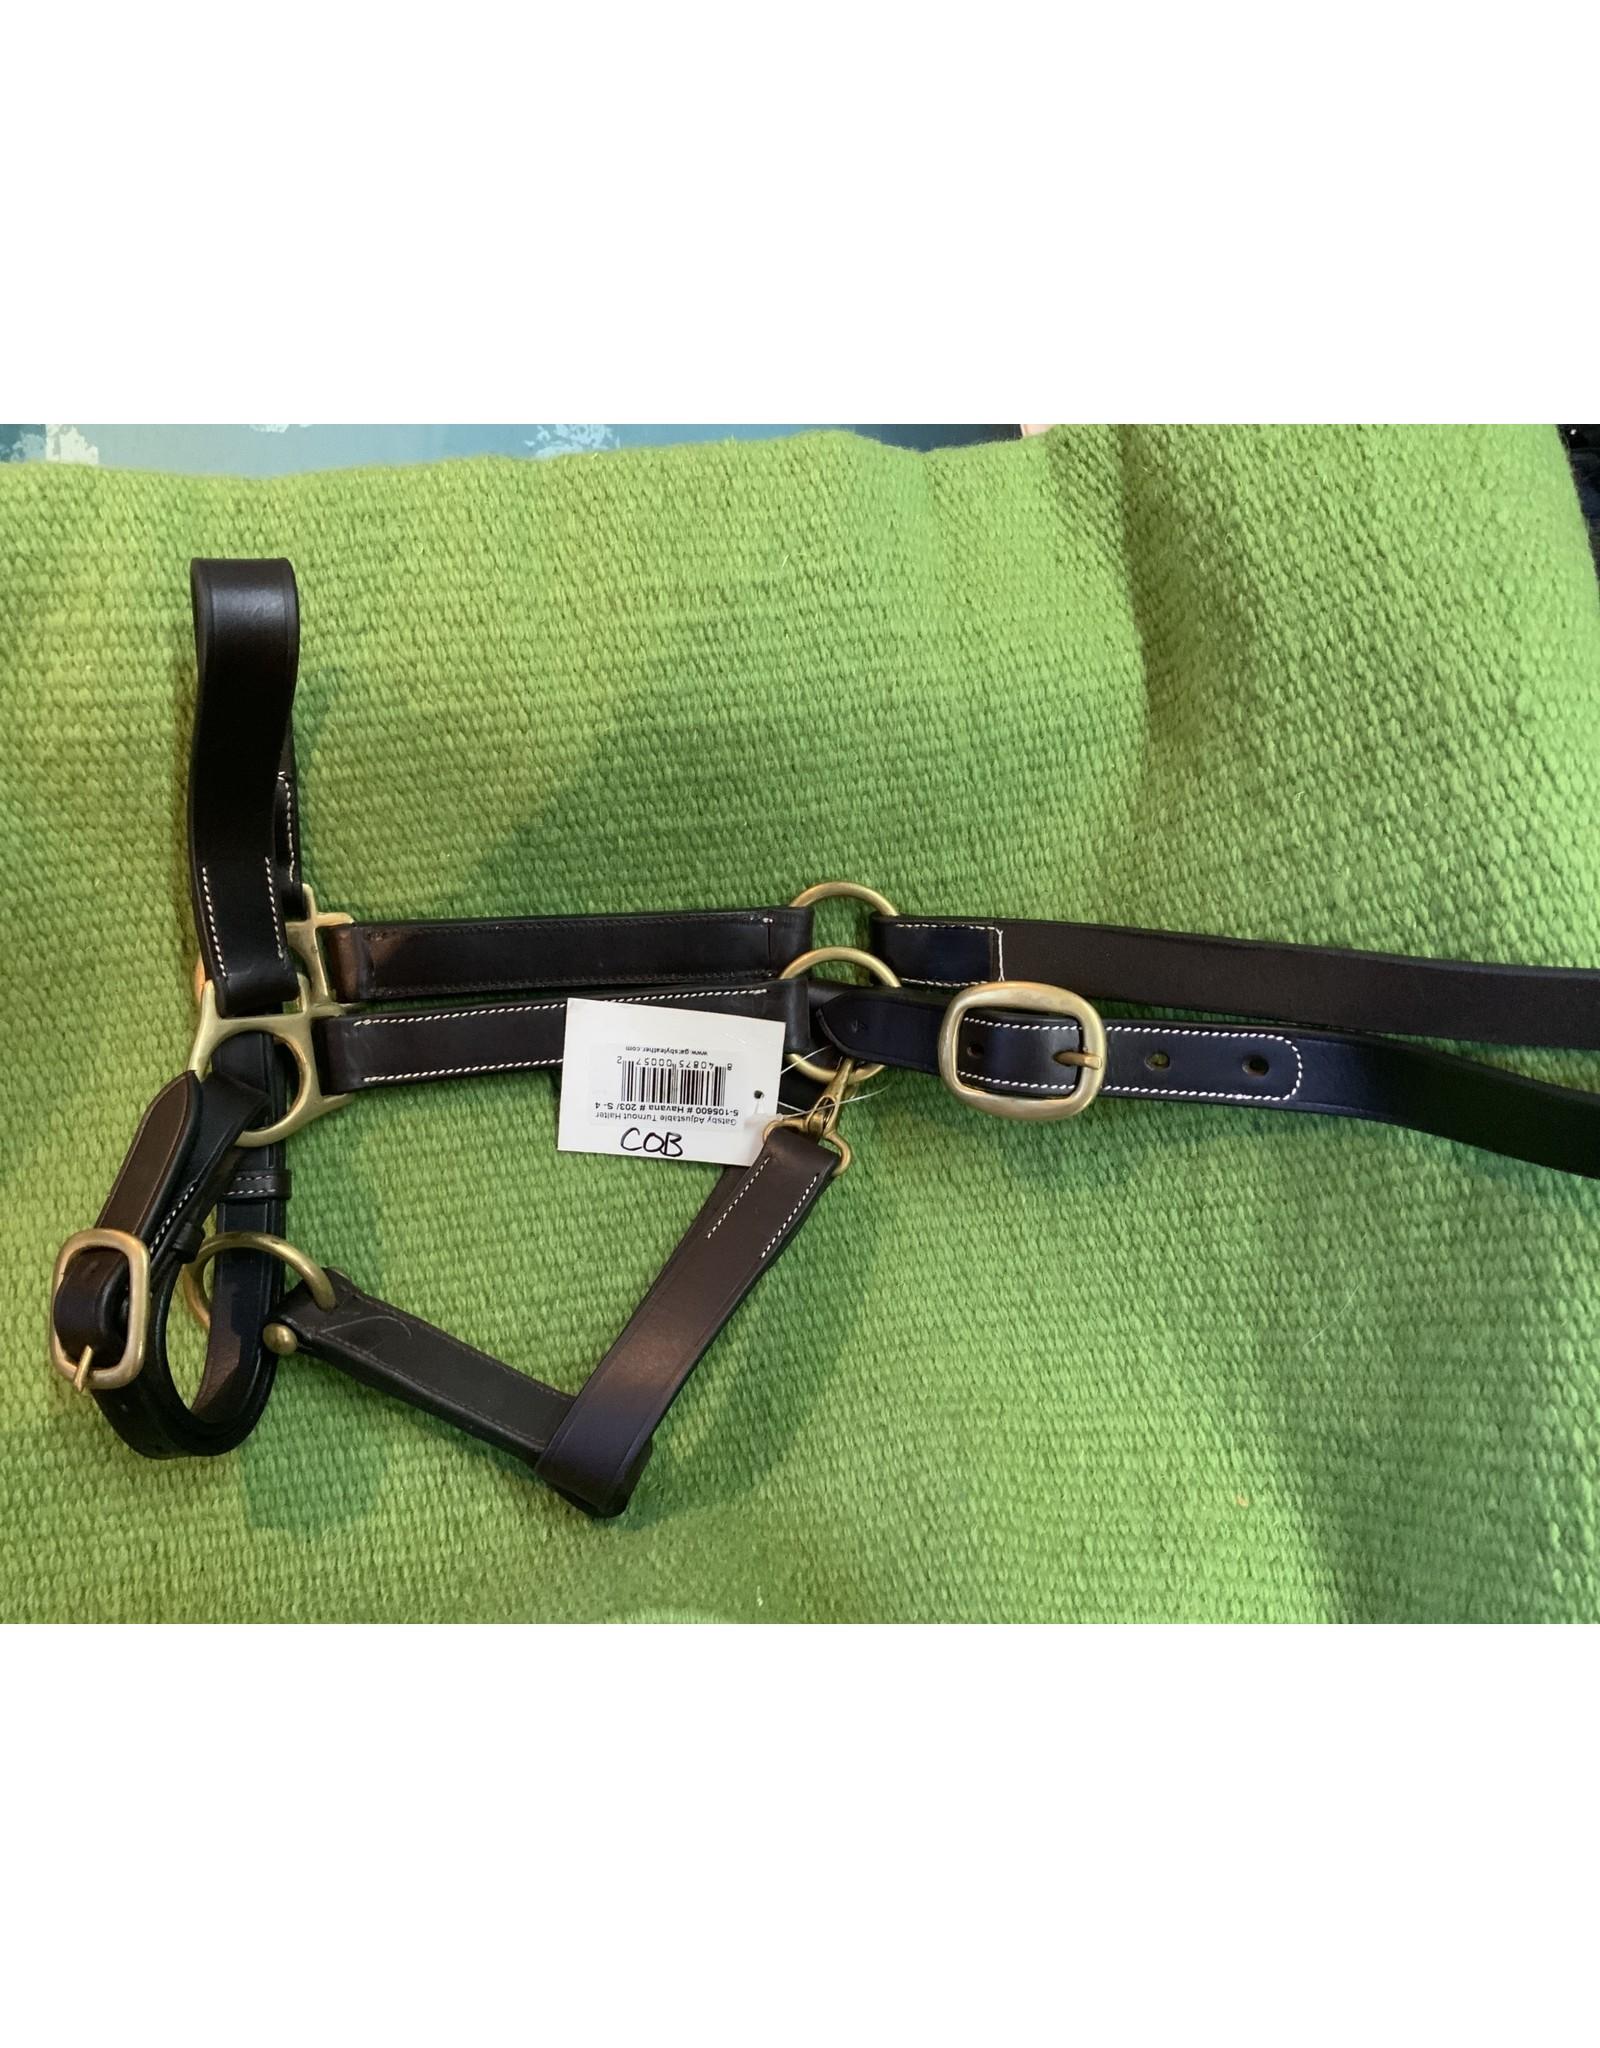 Adjustable Leather Halter - COB. Horse GL203-S4C